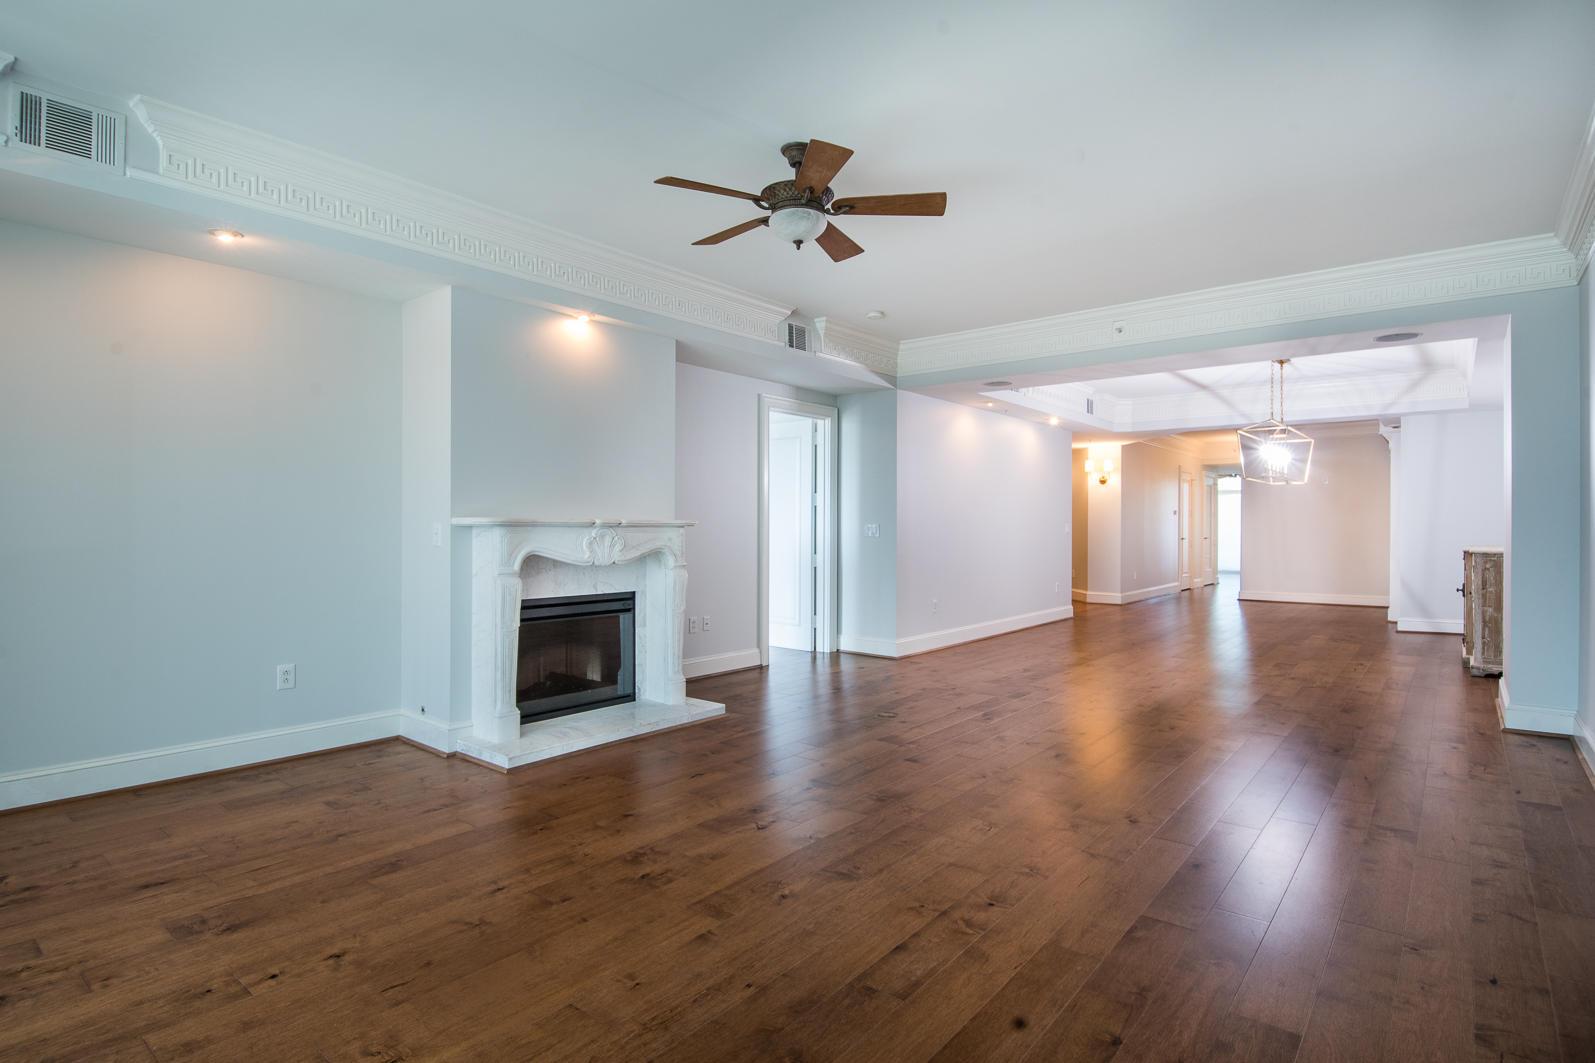 Renaissance On Chas Harbor Homes For Sale - 144 Plaza, Mount Pleasant, SC - 6